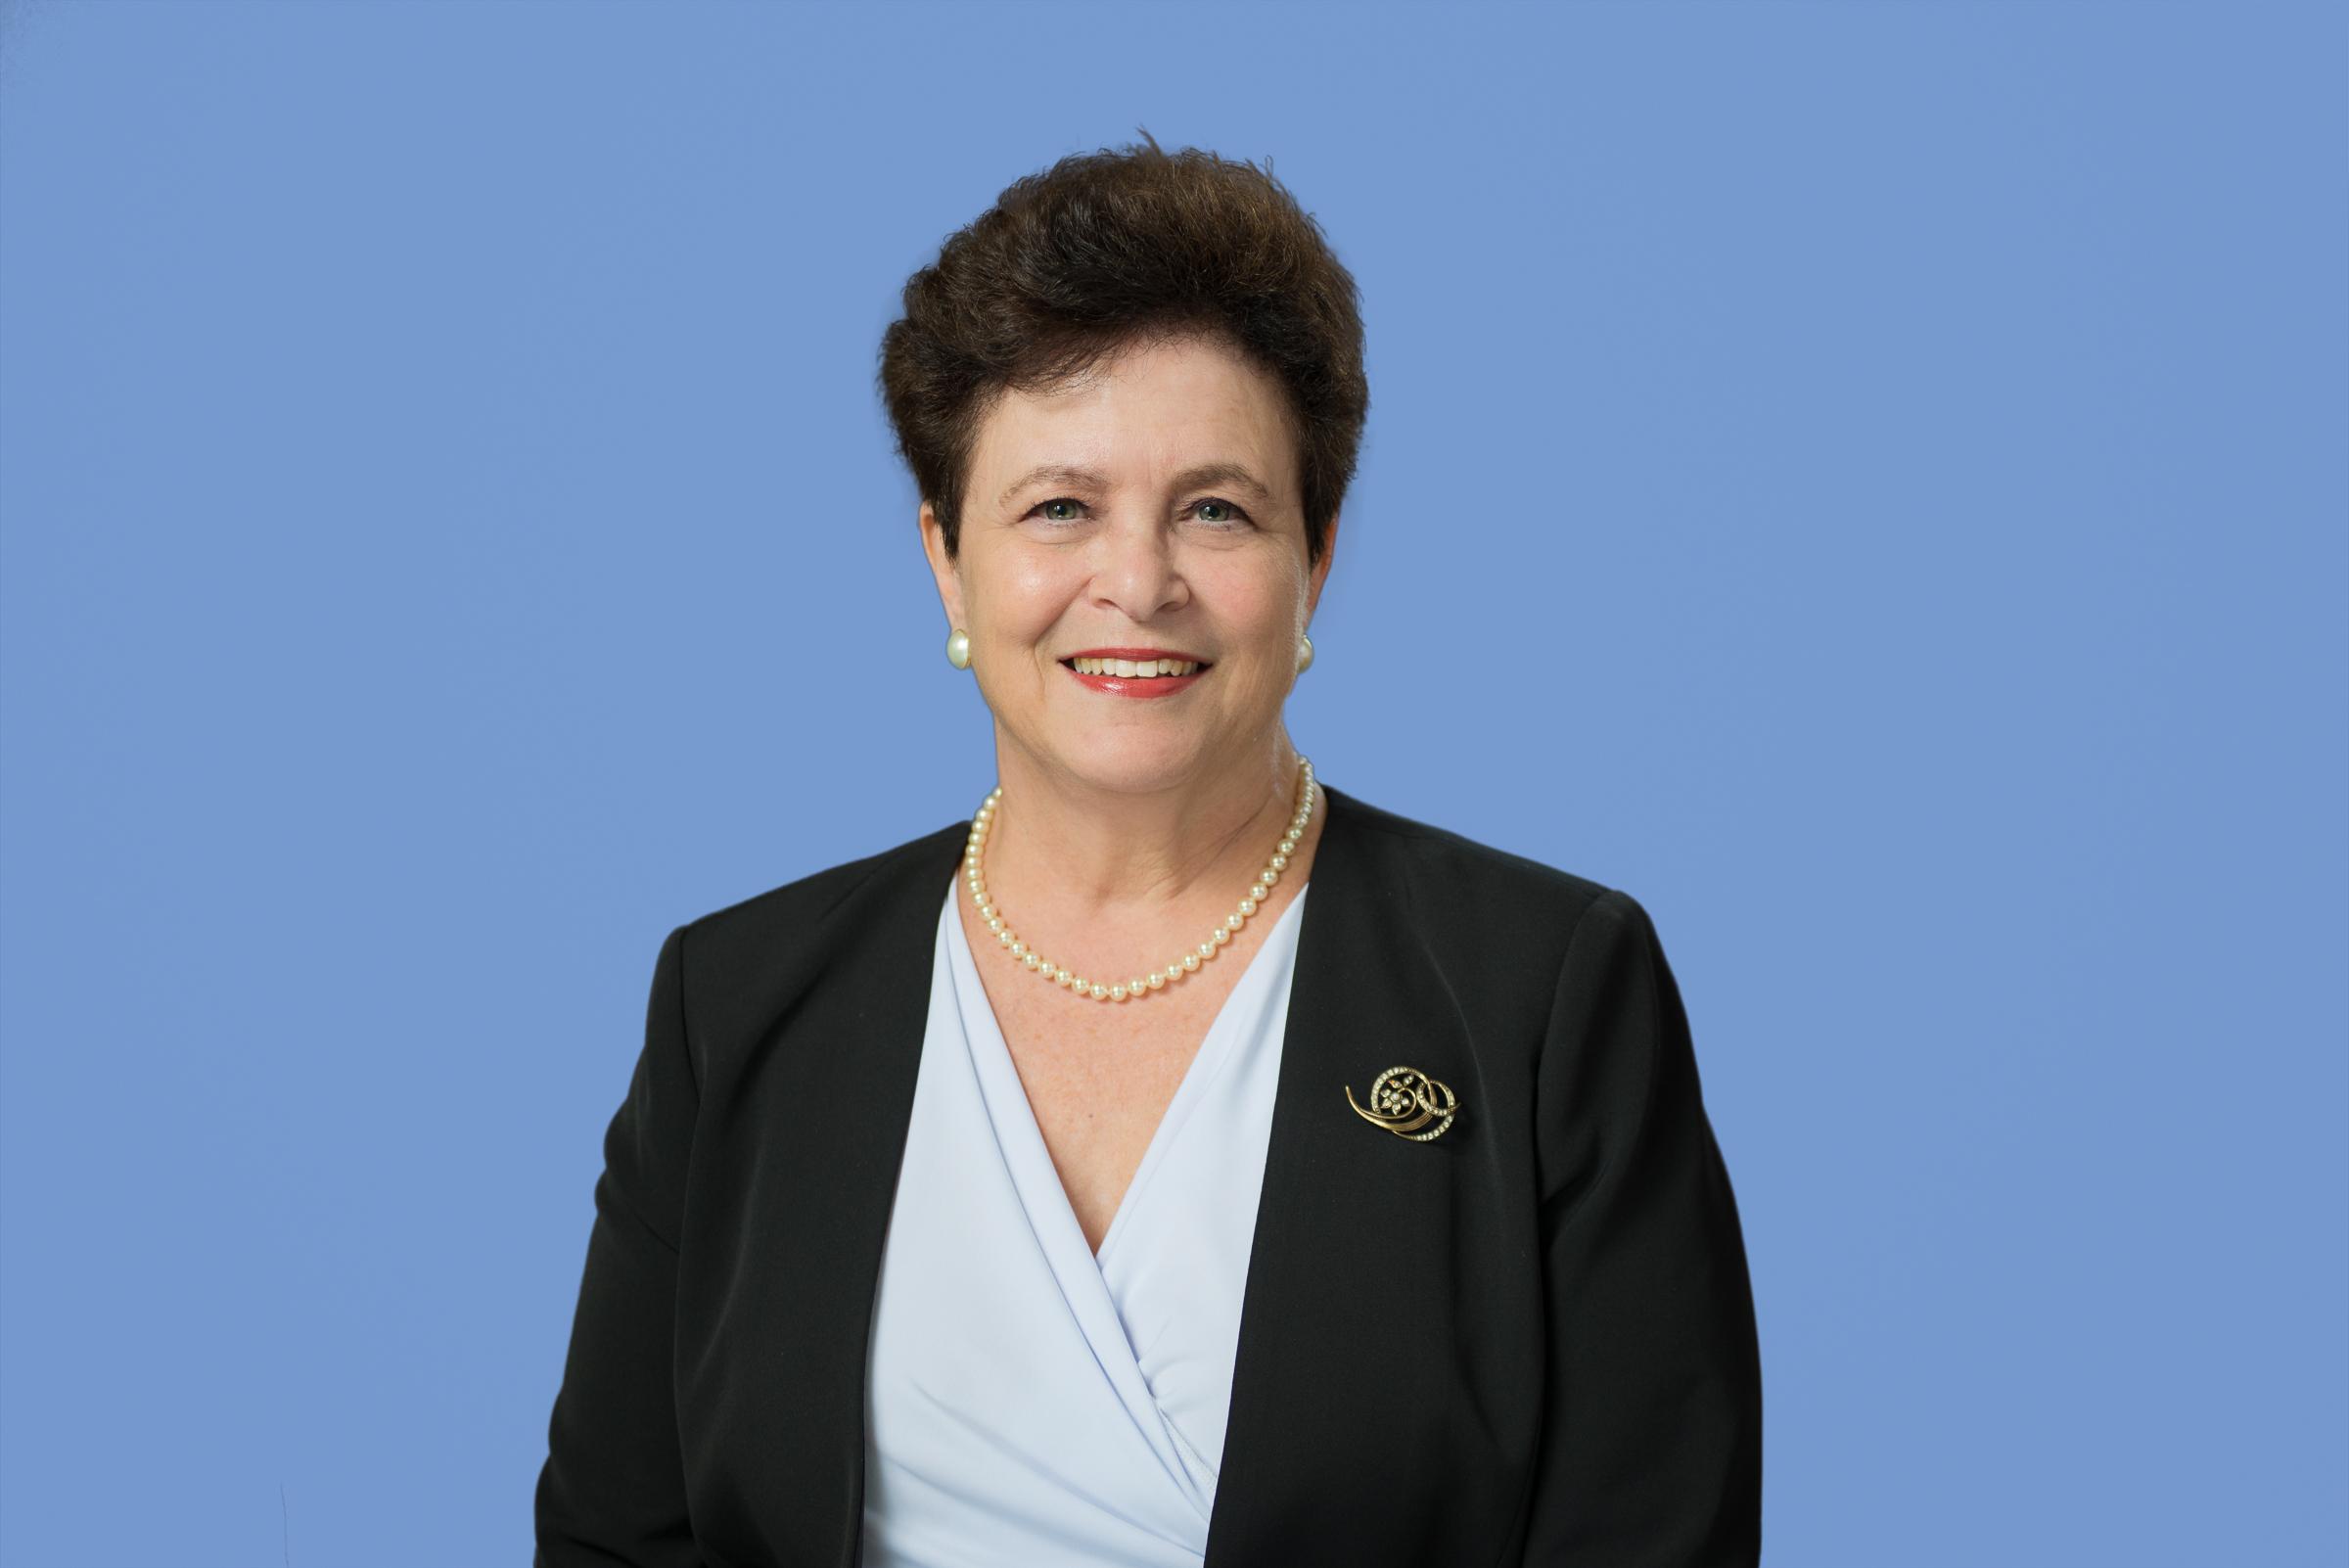 Deborah Gofreed, MD, FACP, FCCP, FAASM - Leesburg, VA 20176 - (703)858-5421 | ShowMeLocal.com